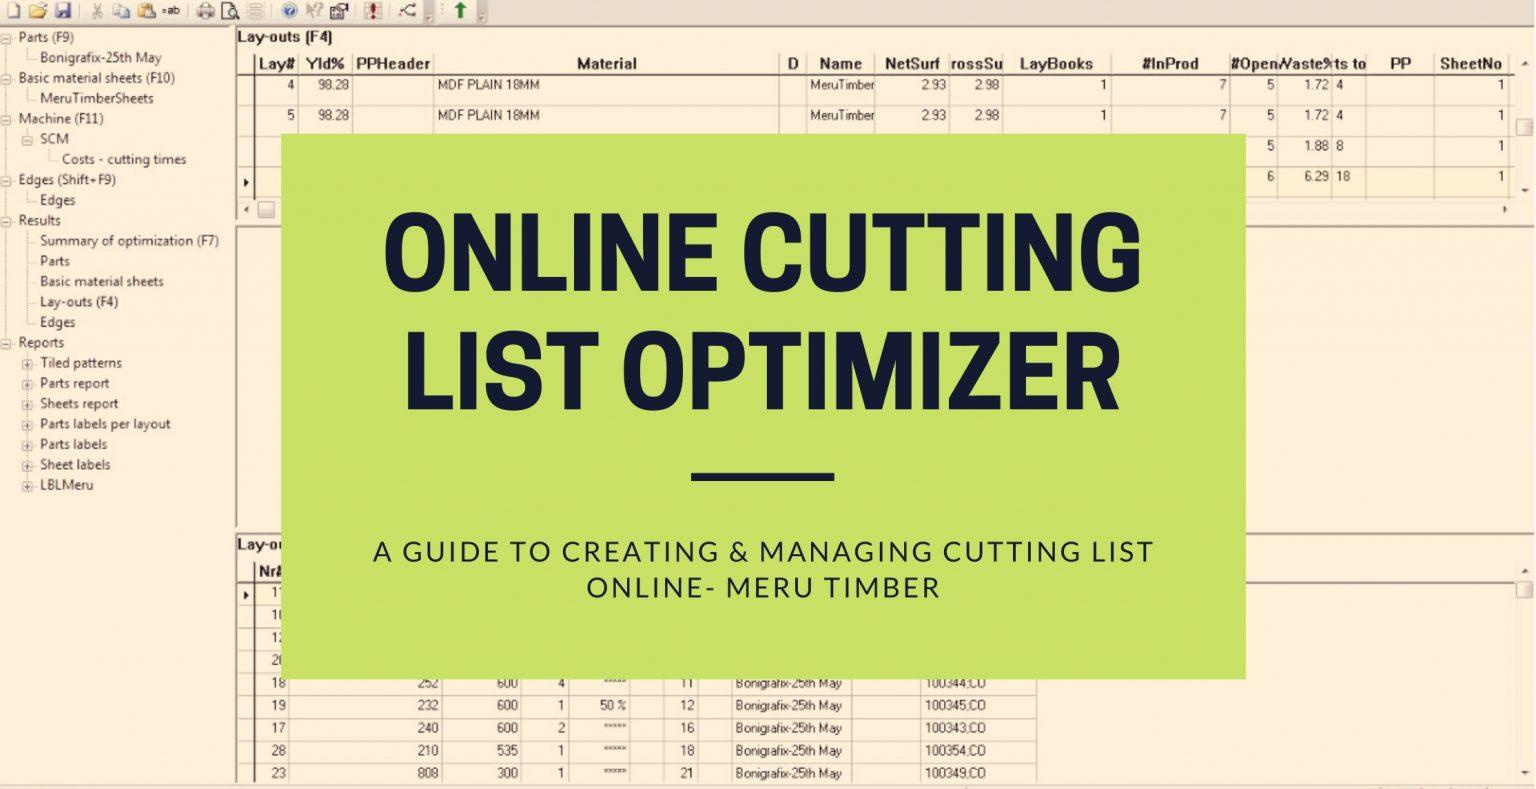 Online cutting list optimizer